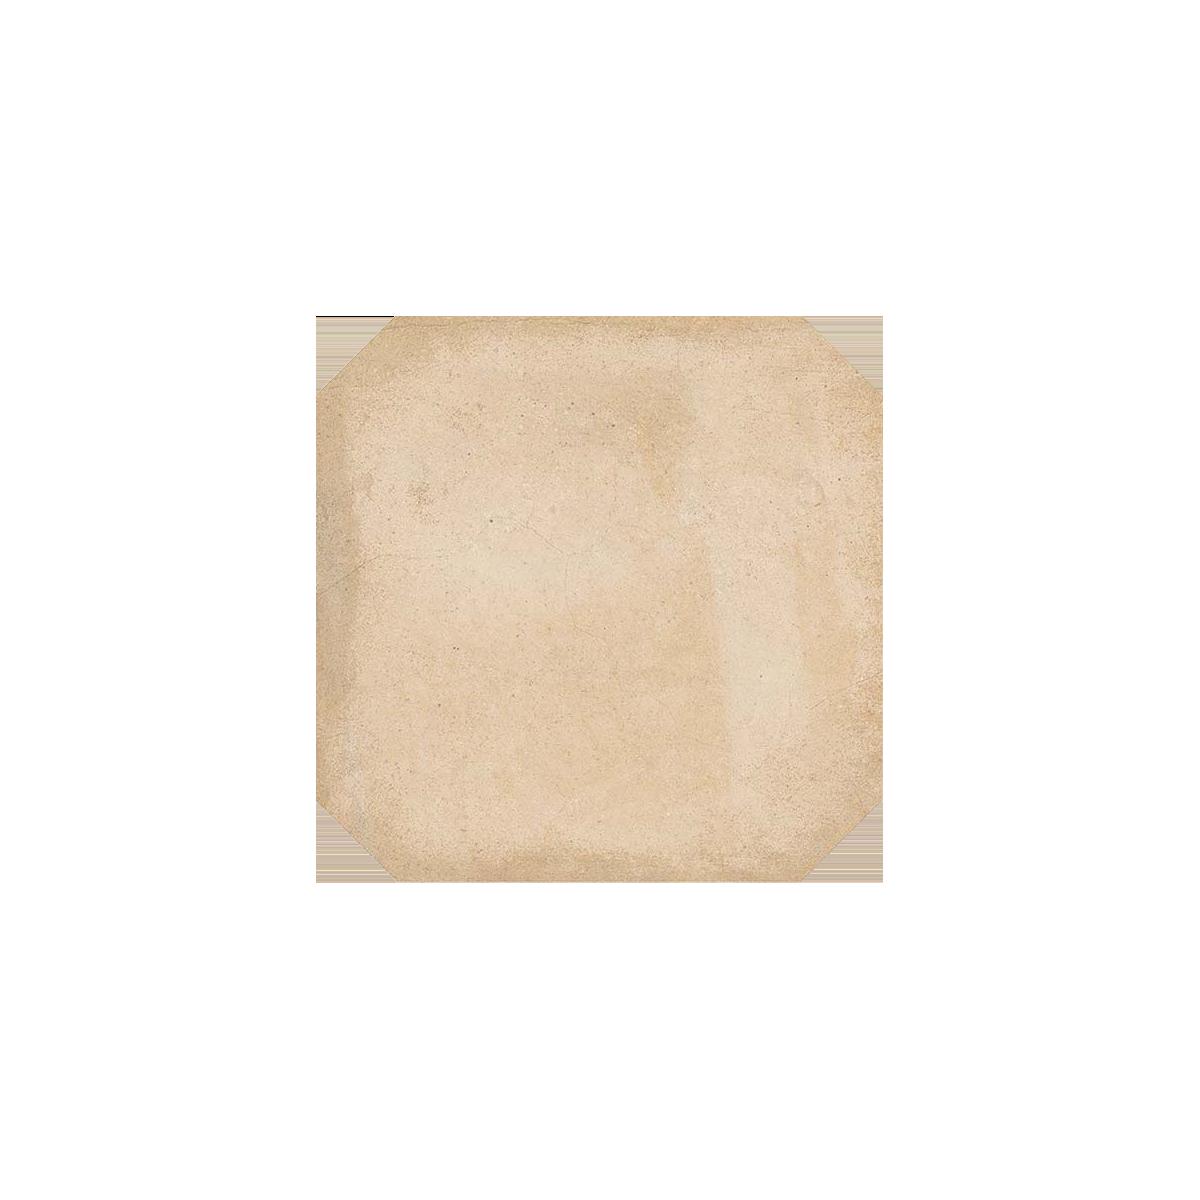 Colton Beige Octogonal - Pavimento no rectangular - Marca Vives